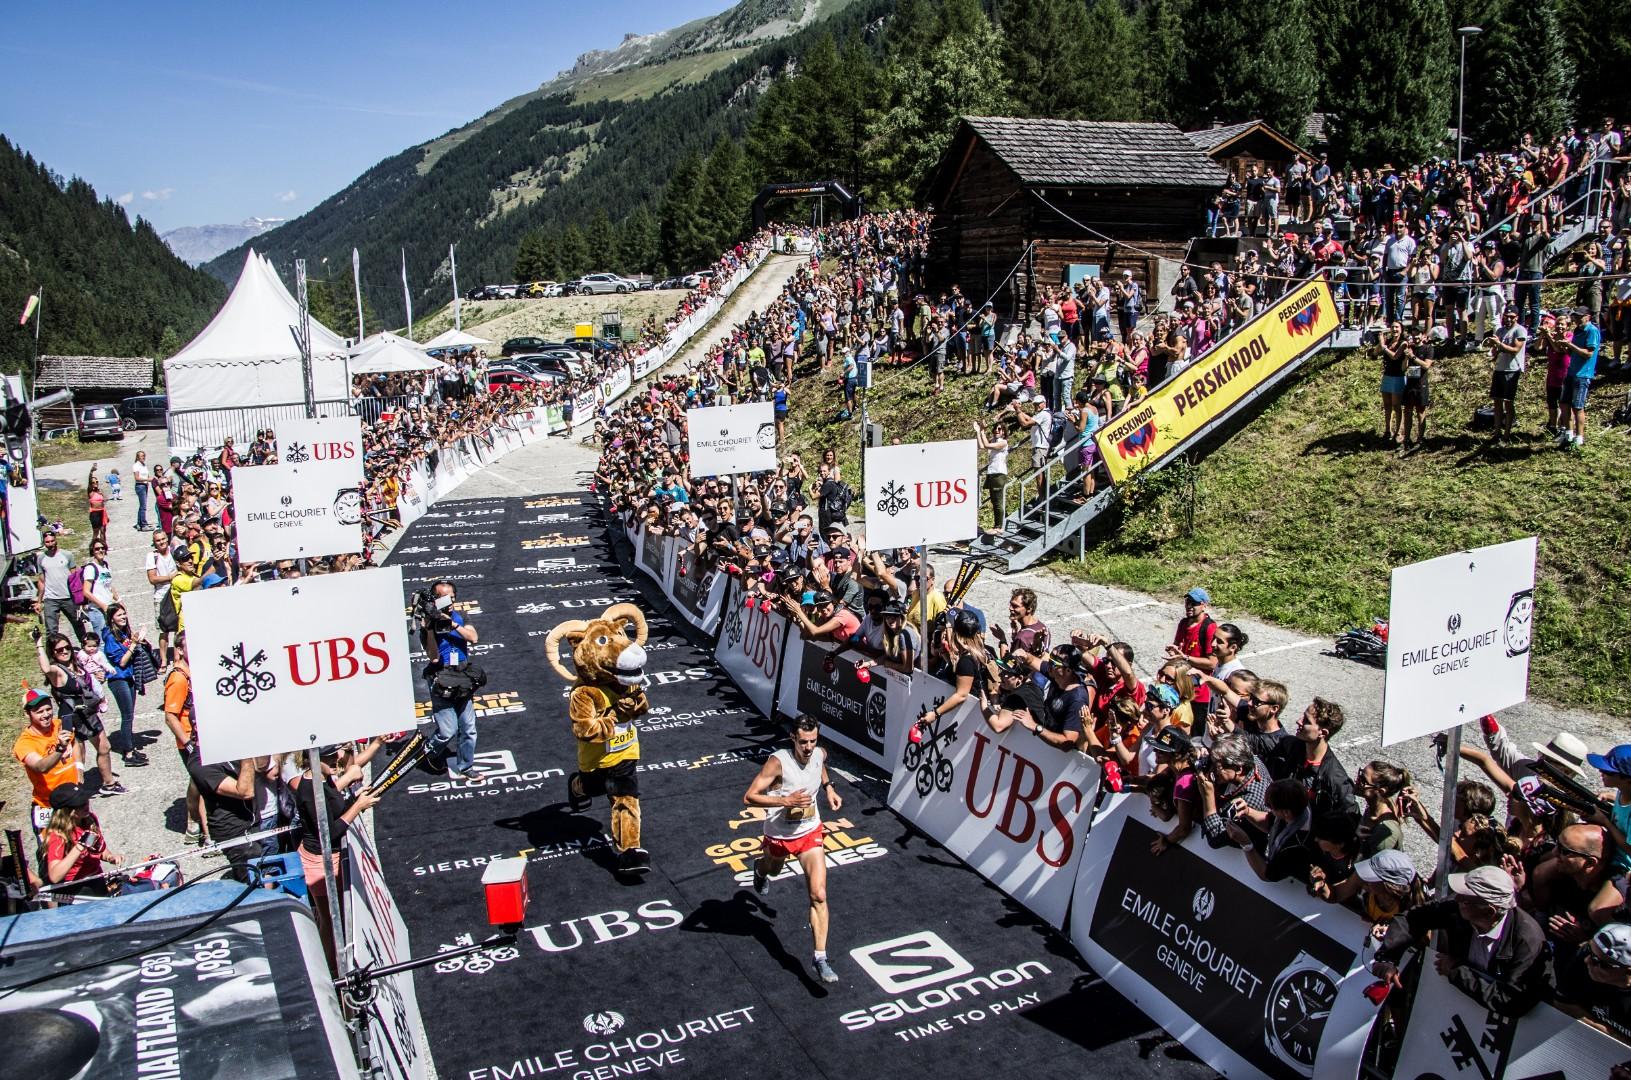 Kilian Jornet winning last year's race (credit: Val d'Anniviers Tourism)